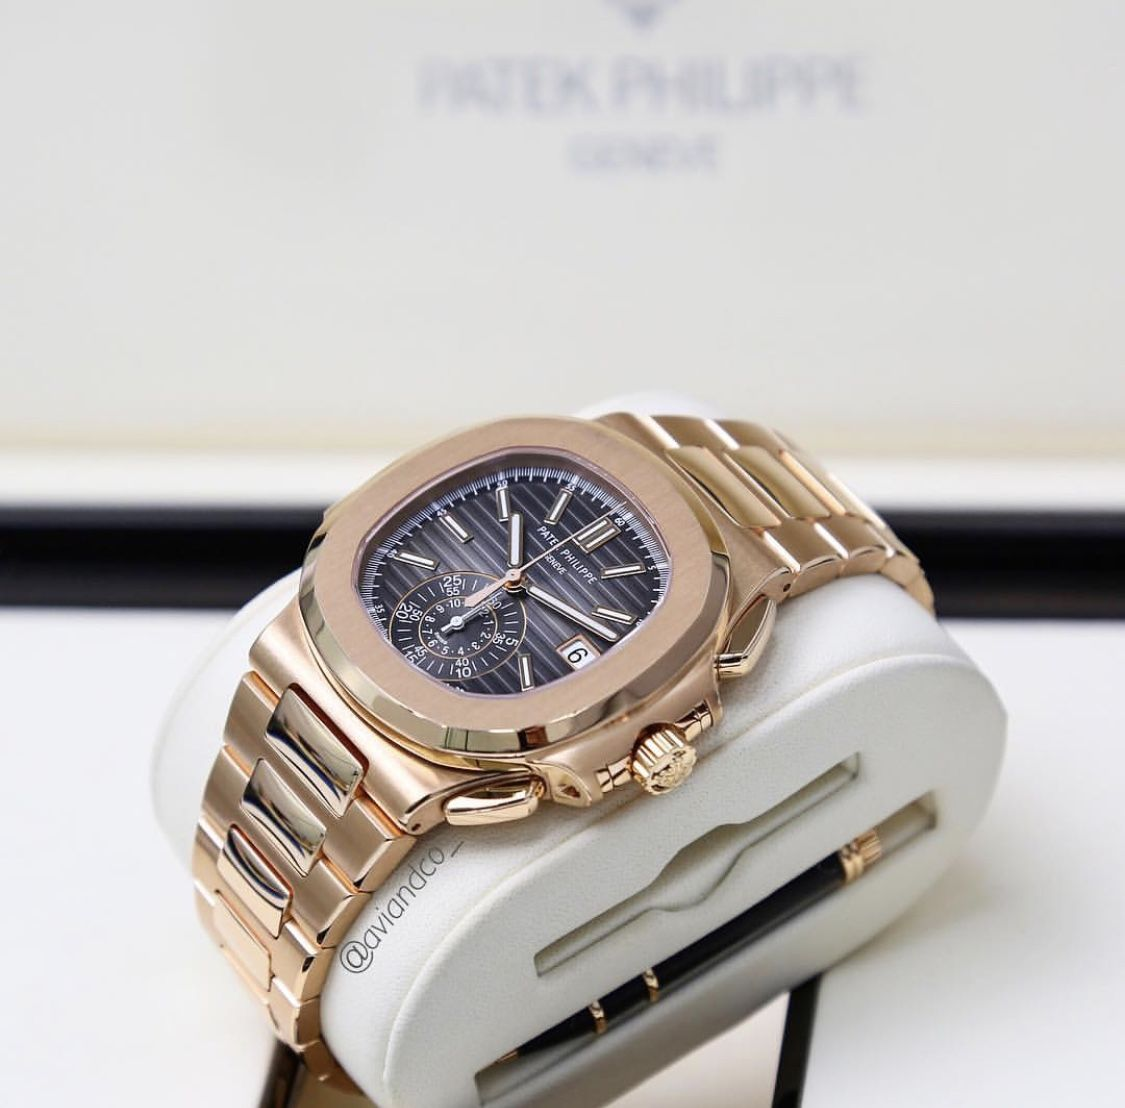 d45e884c5a6 Patek Philippe Ref. 5980 1R-001